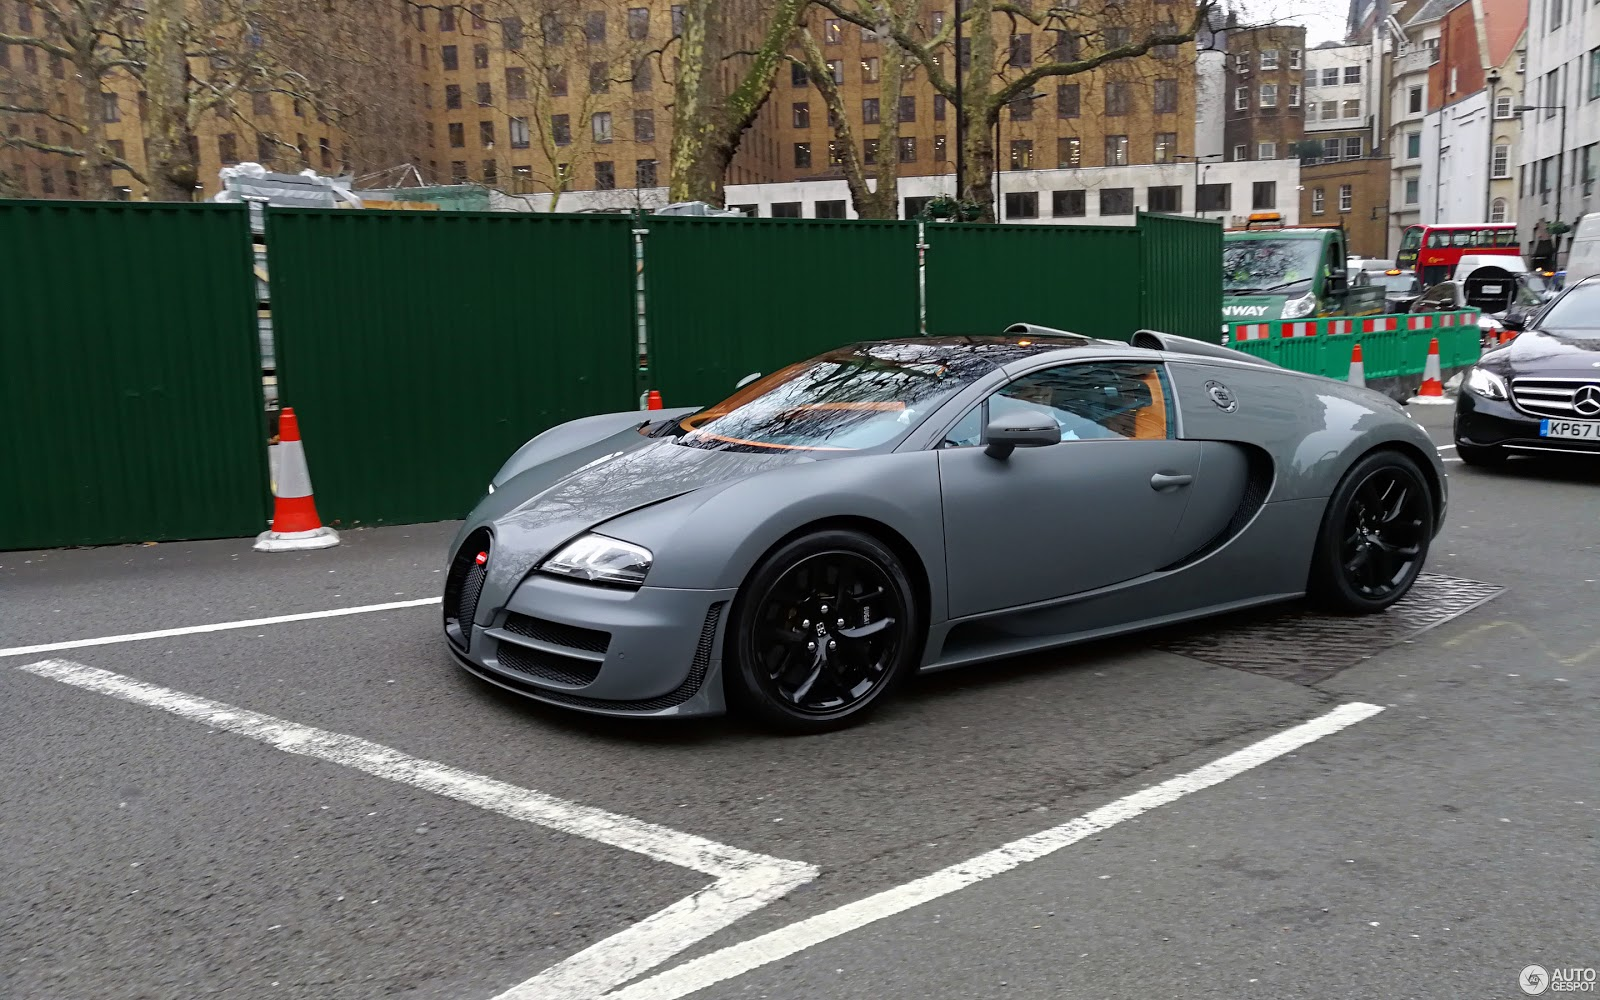 veyron Πόσο κοστίζει η αλλαγή λαδιών σε μια Bugatti; Bugatti, Bugatti Veyron, service, λάδια